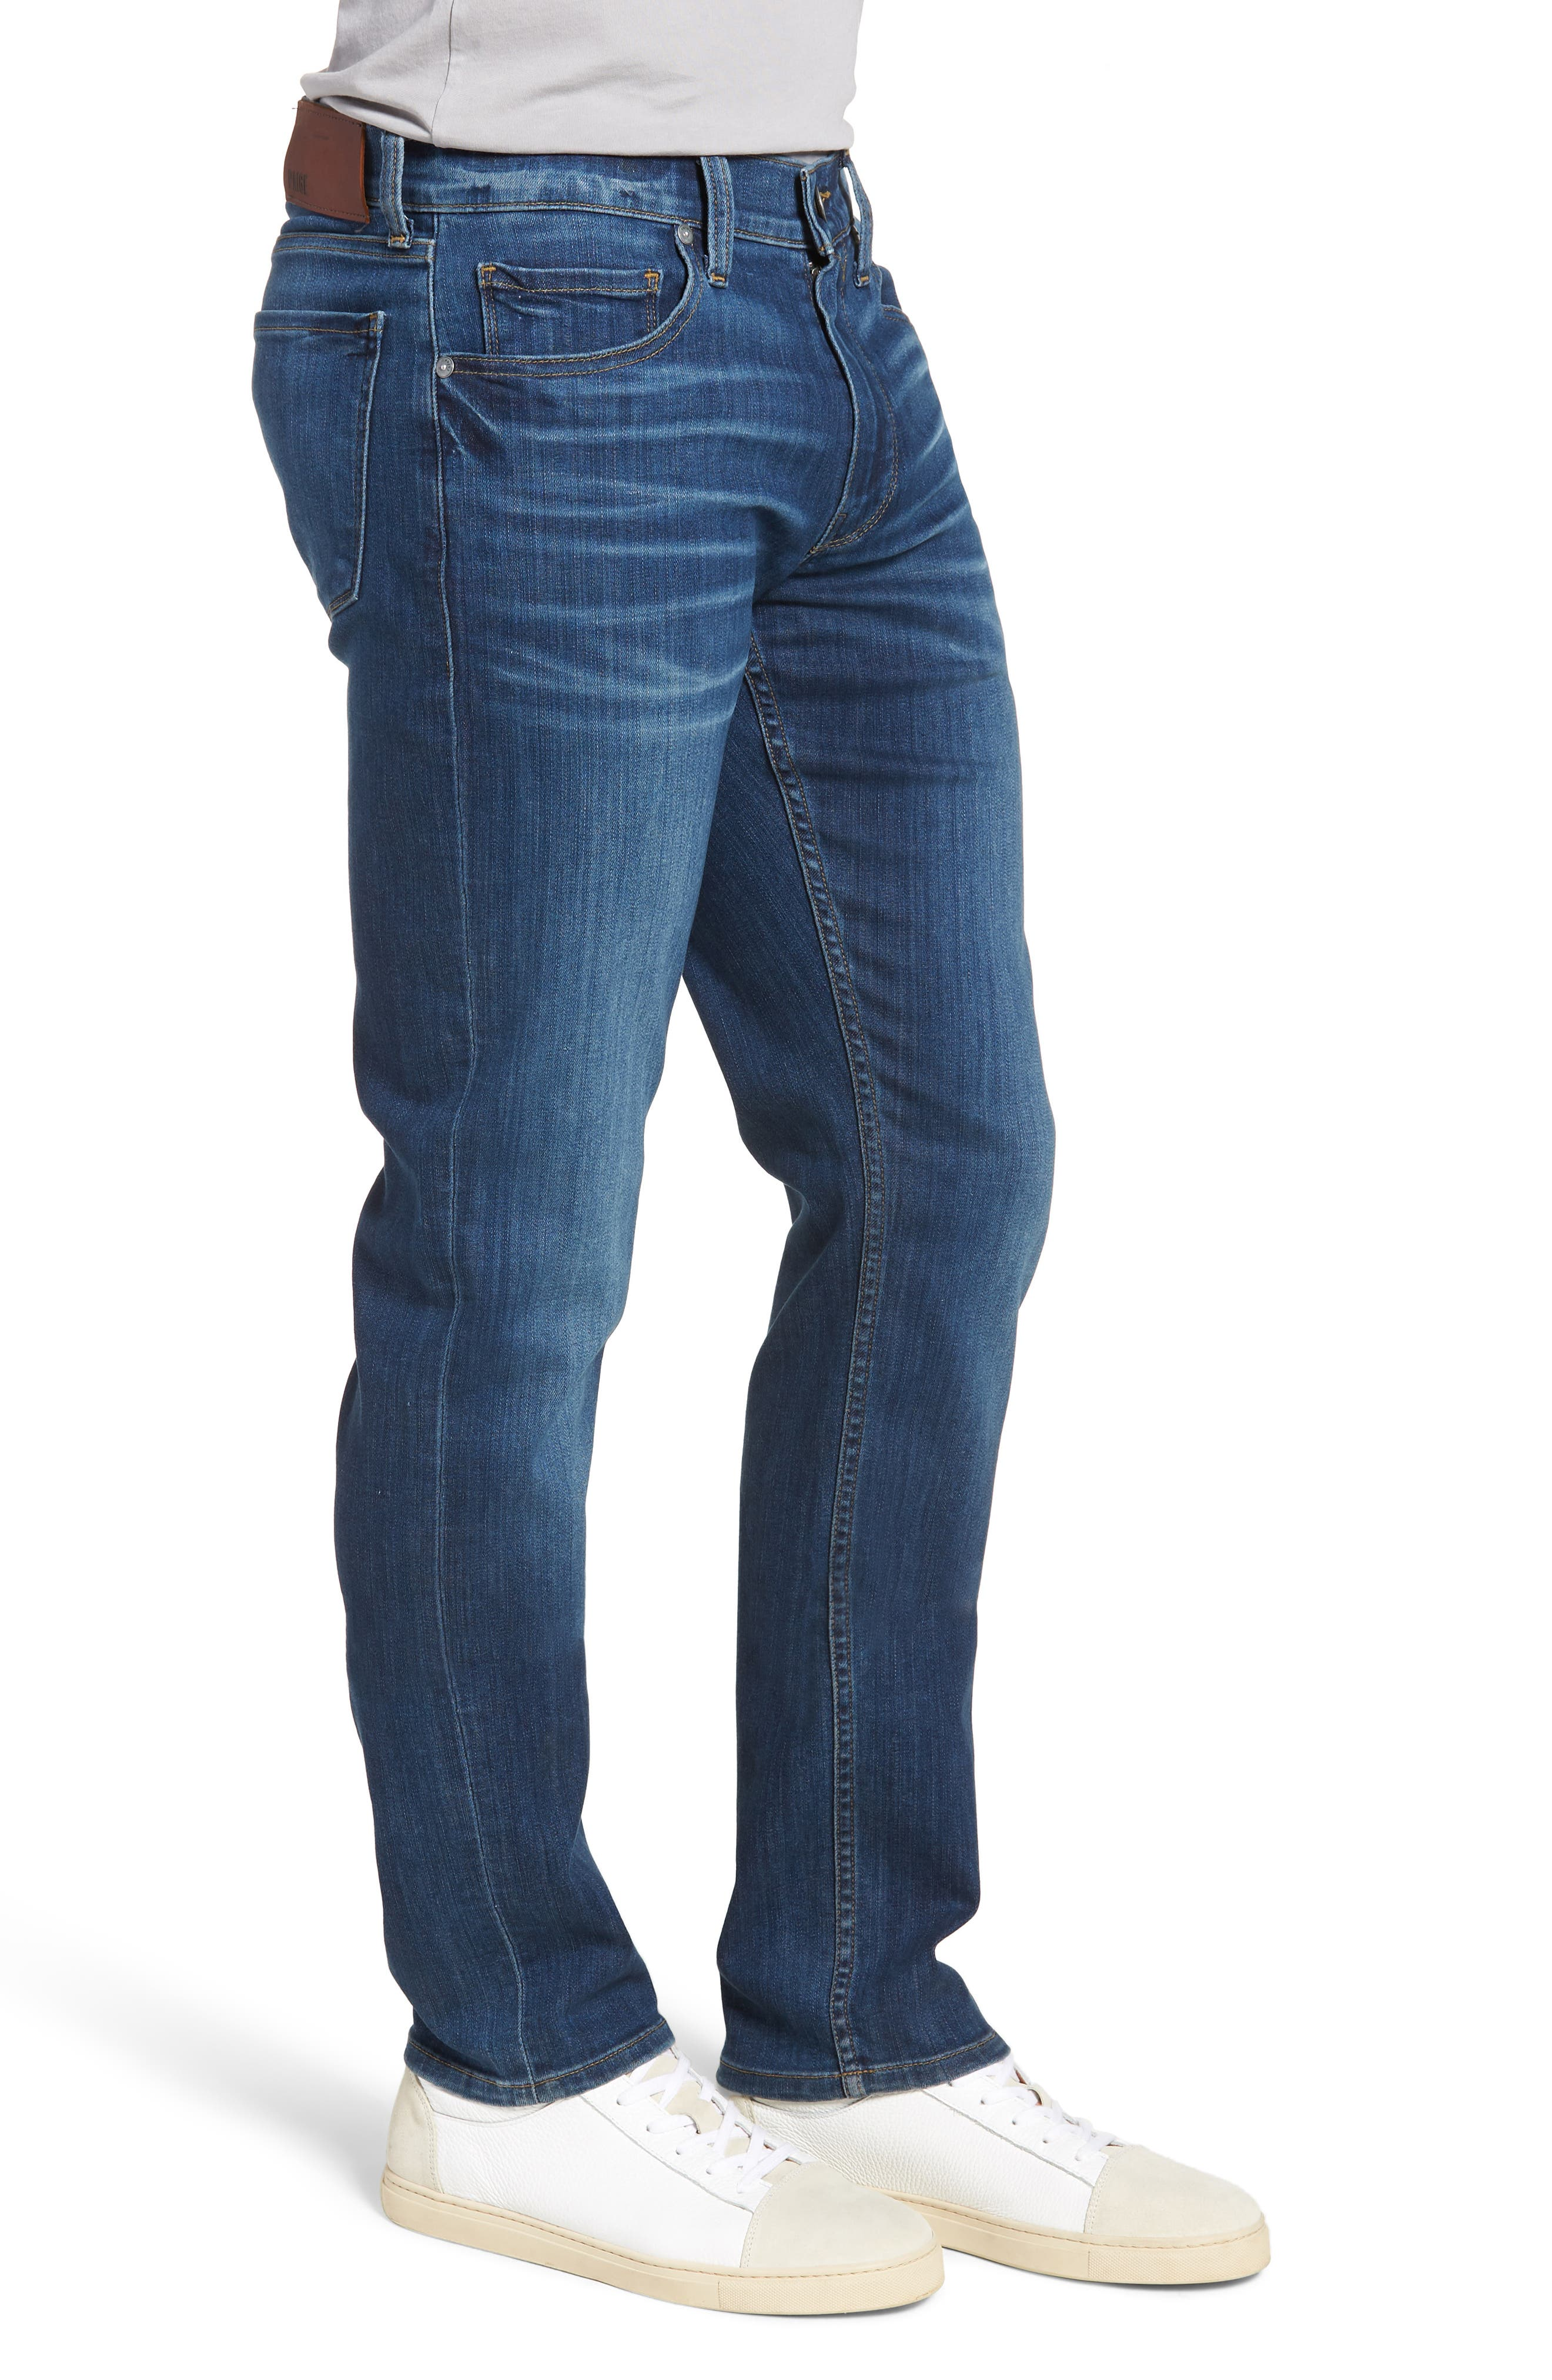 Transcend - Lennox Slim Fit Jeans,                             Alternate thumbnail 3, color,                             400